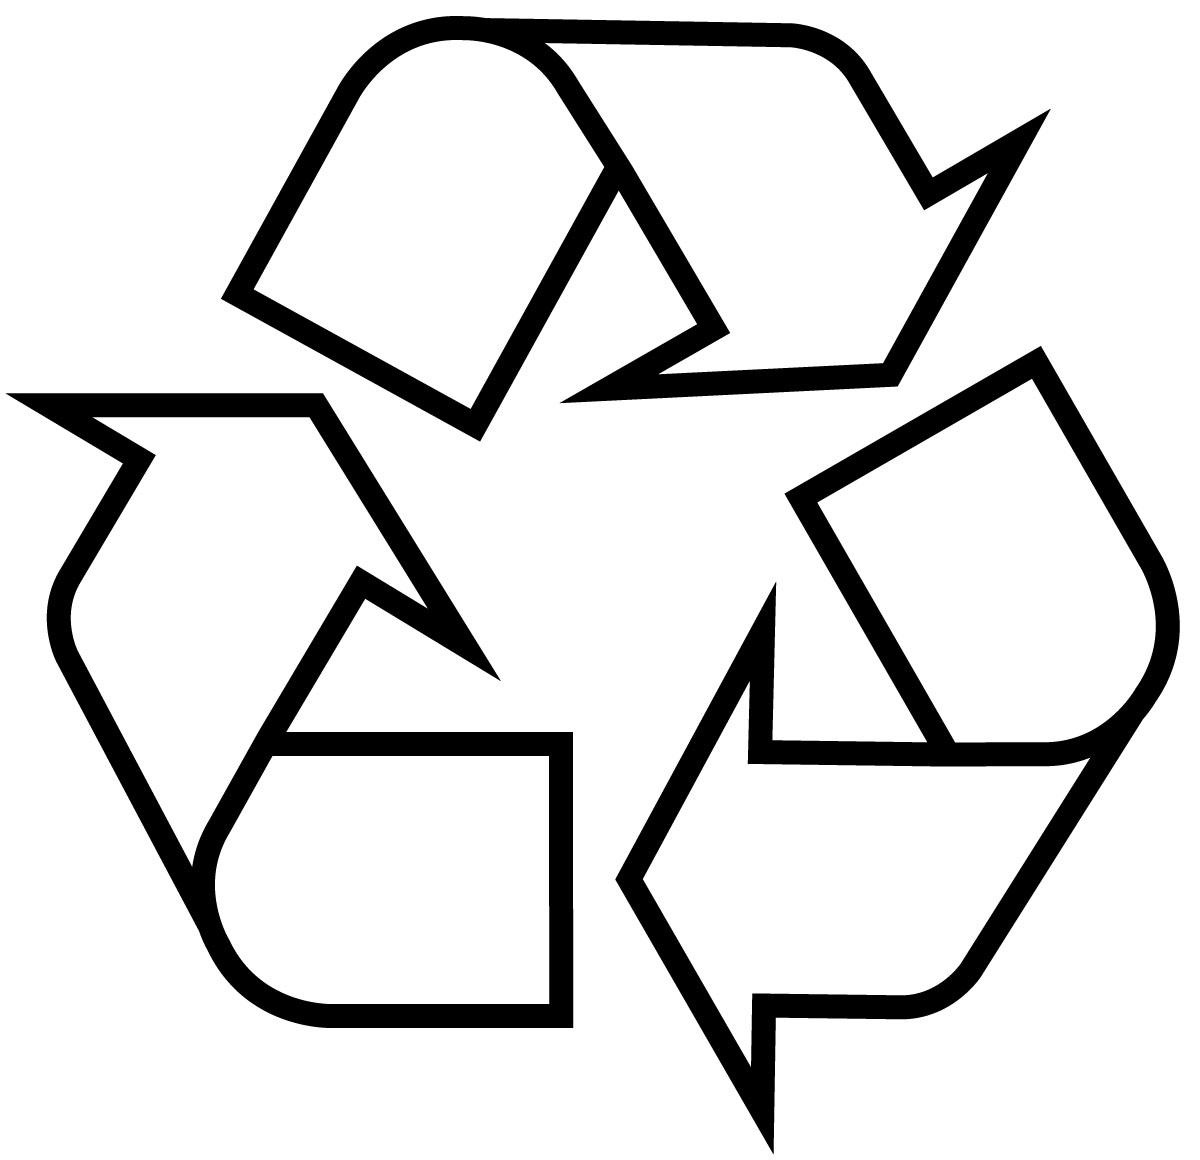 Using the EPA Seal and Logo.